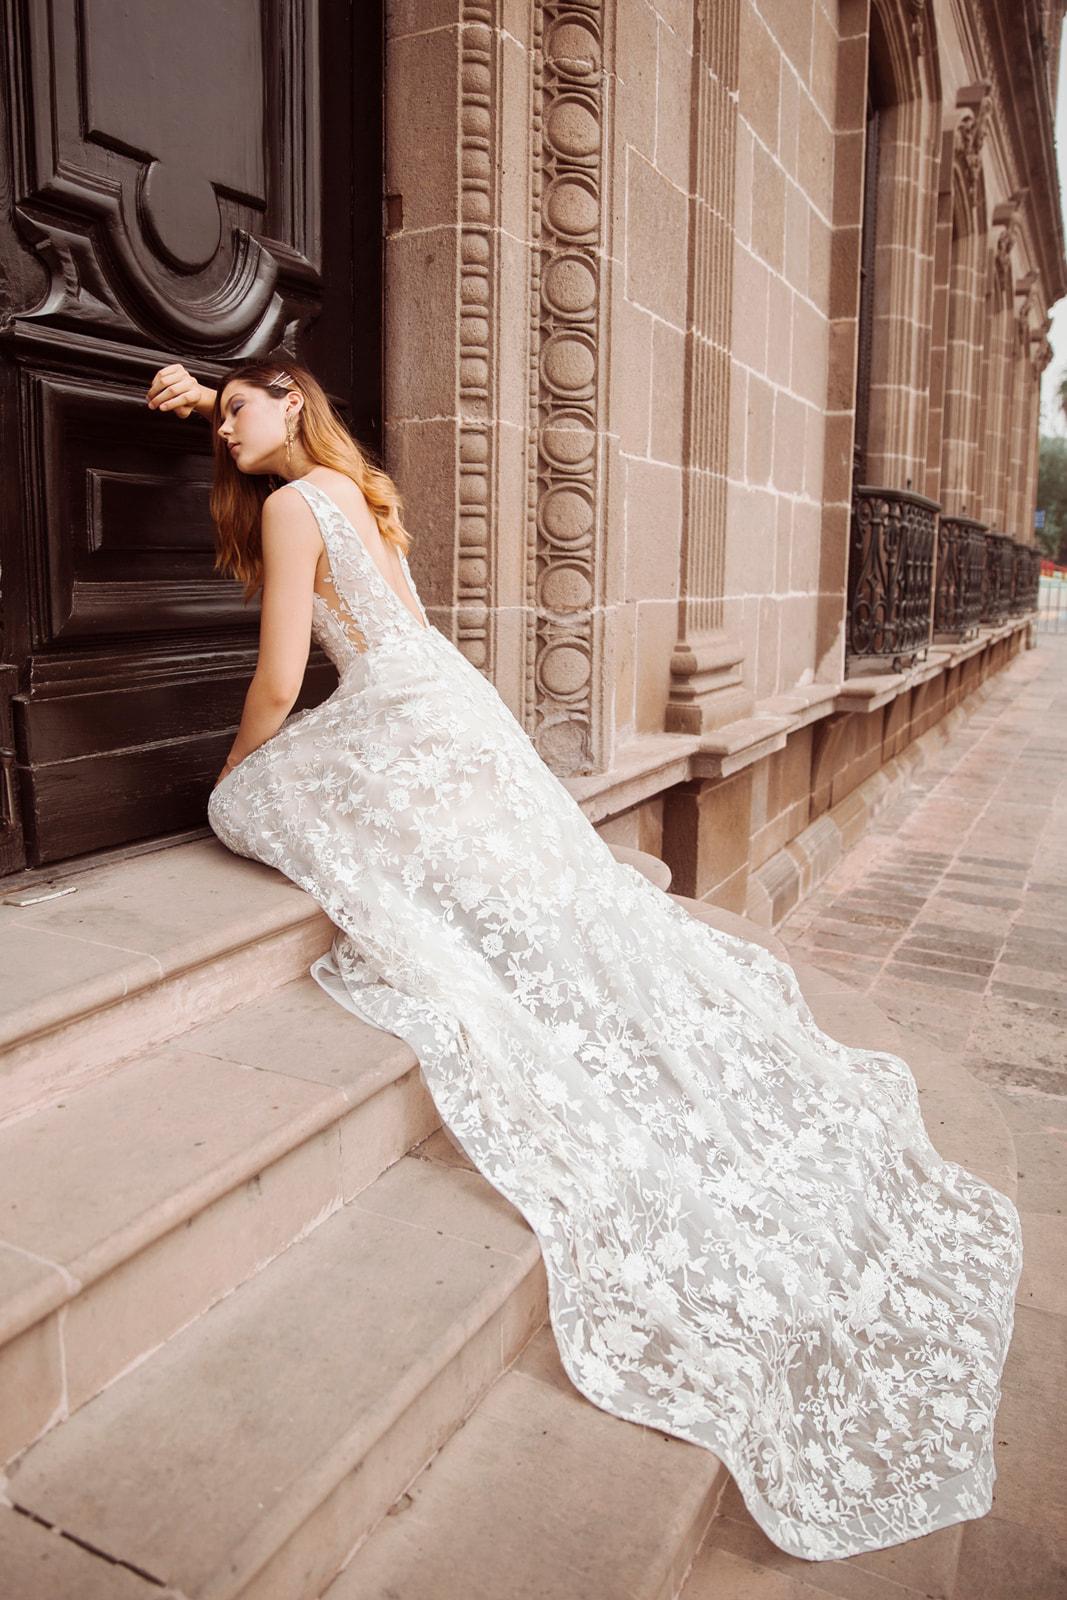 Carlotta_dress_(7_of_58).jpg